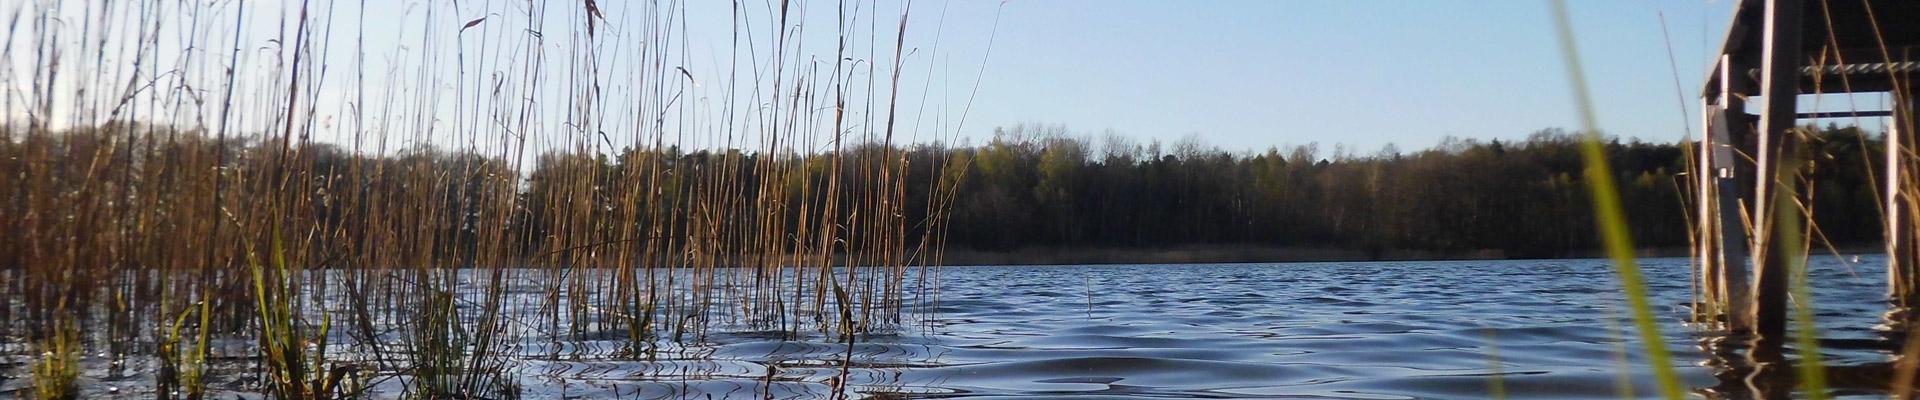 Erlebnis Dahlener Heide